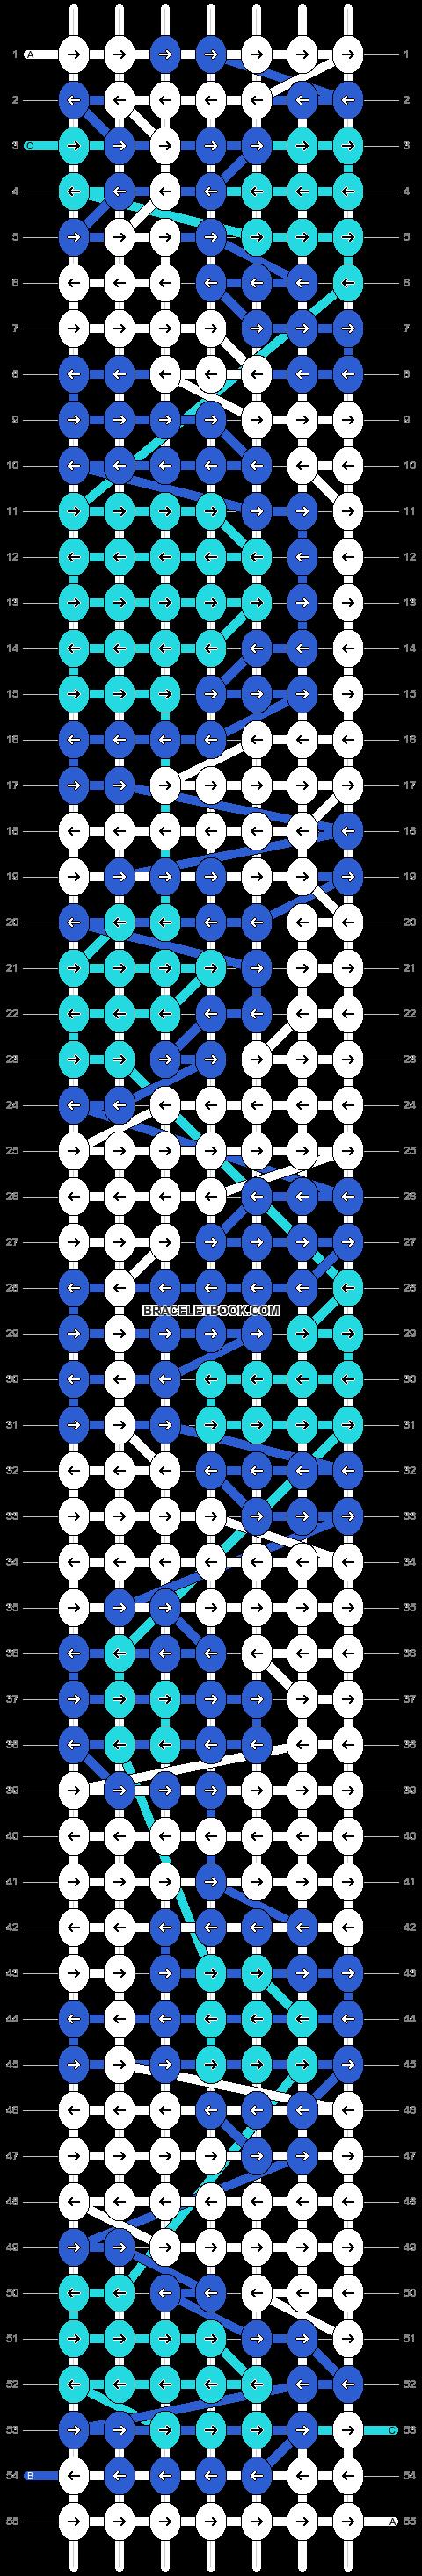 Alpha pattern #20620 pattern